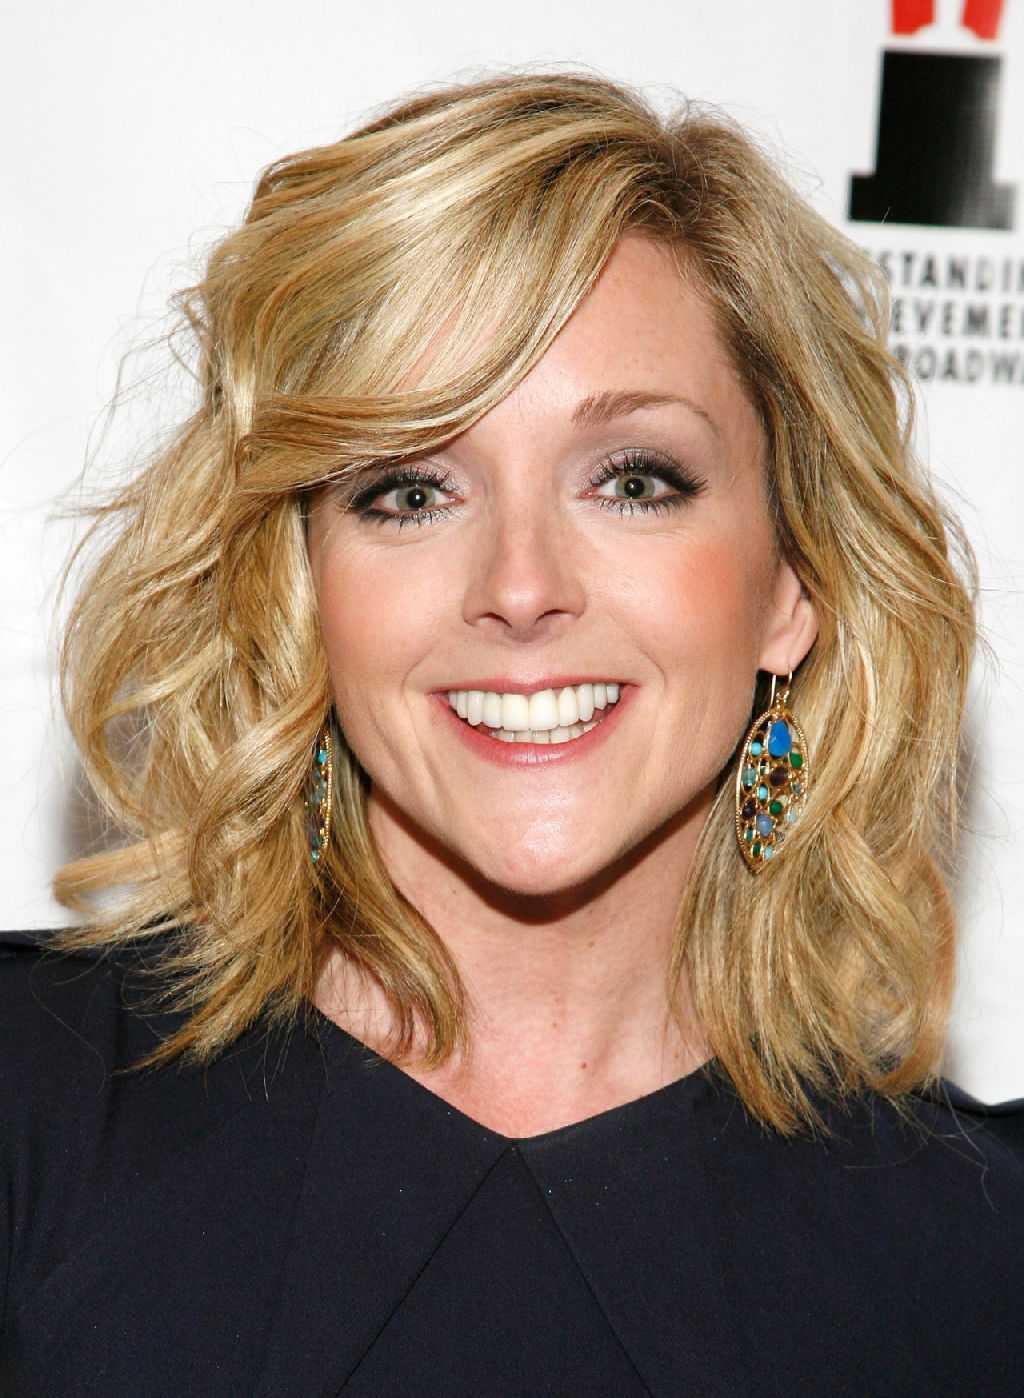 Jane Krakowski Lands A Guest Starring Role On ABC's Modern Family